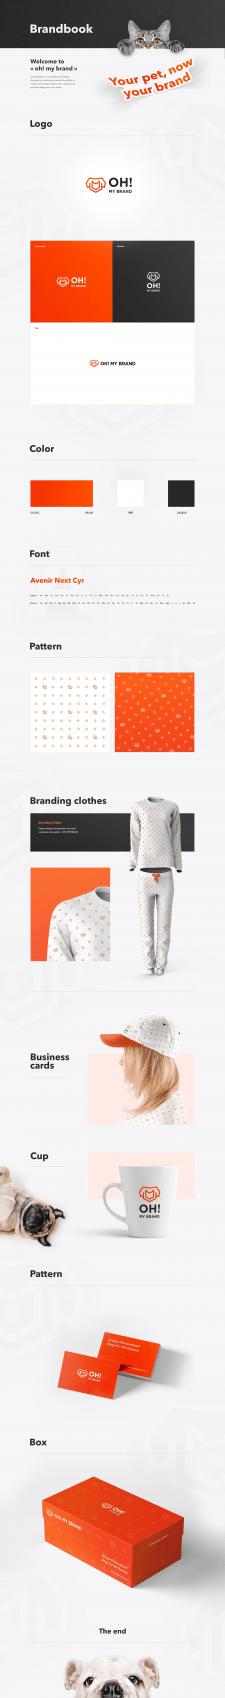 Разработка фирменного стиля Oh! My brand